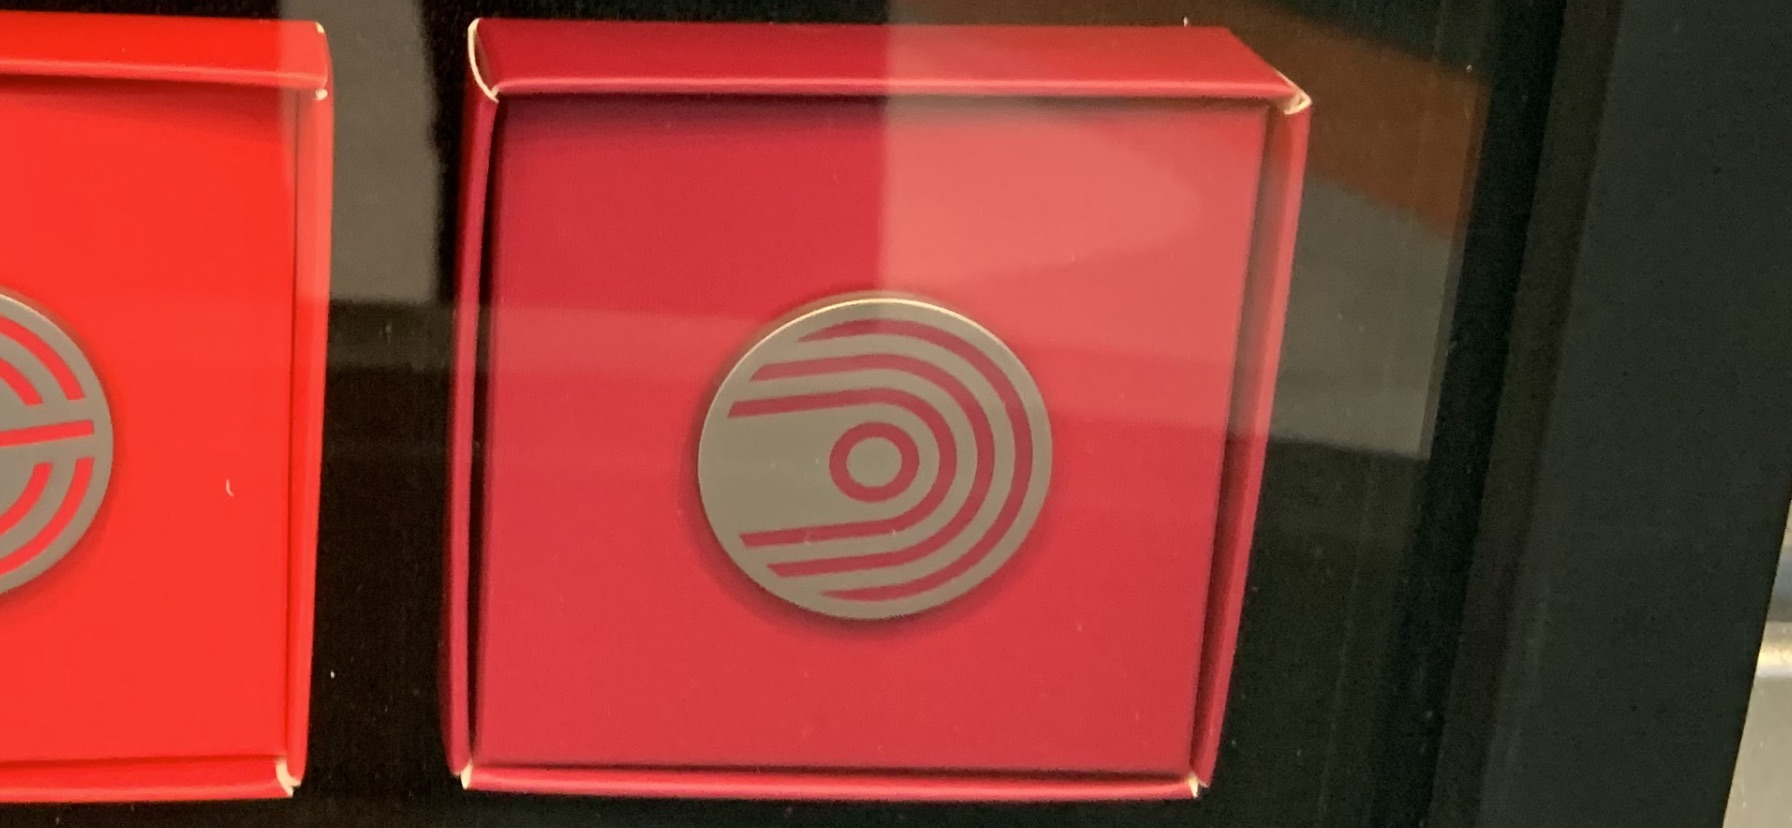 EPCOT pavilion logo pins 12/23/19 24